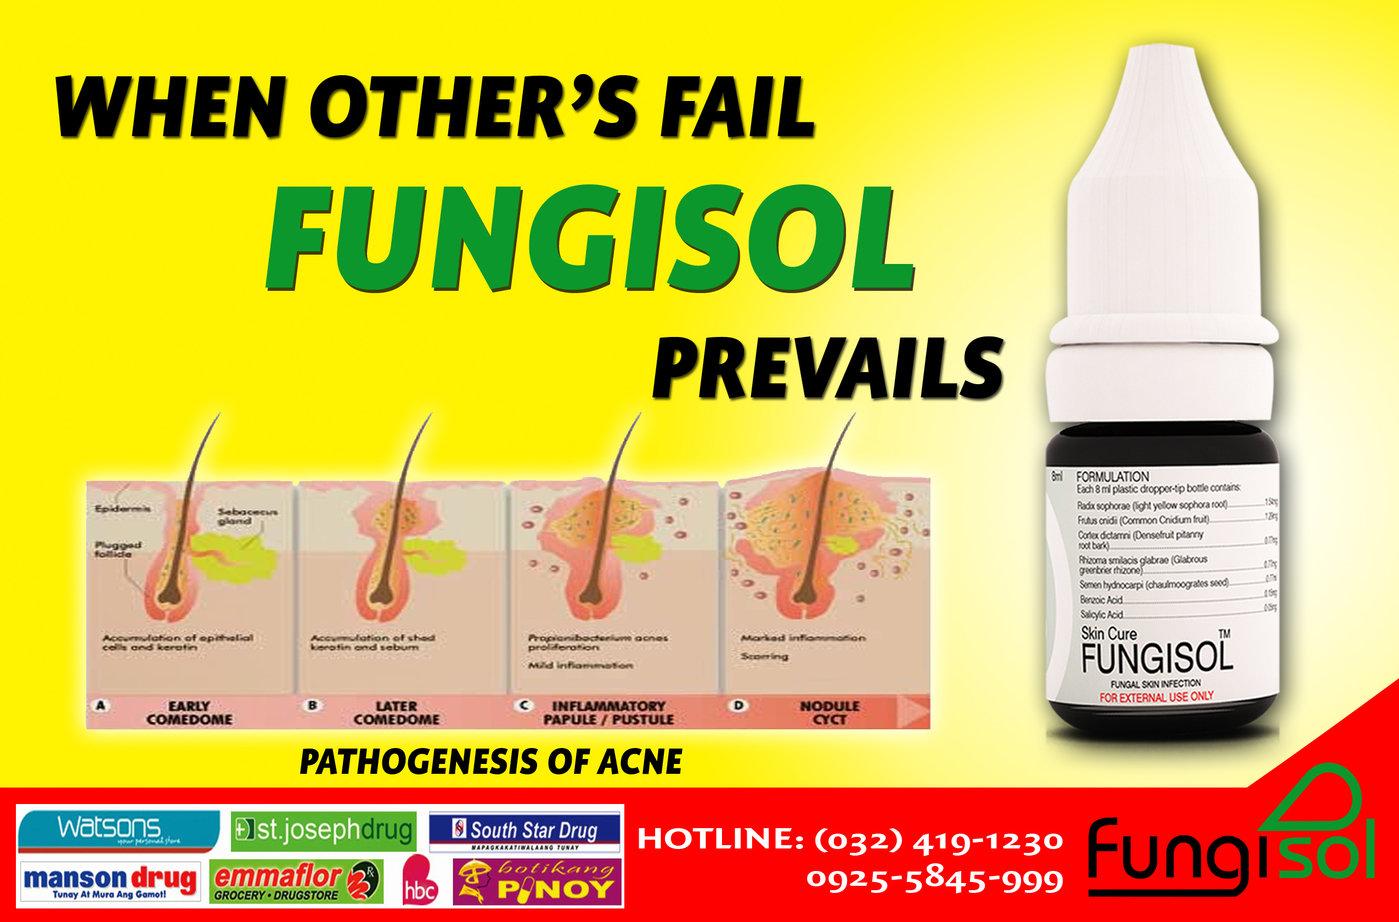 Fungisol Advertisement By Marilyn Sisa At Coroflot Com